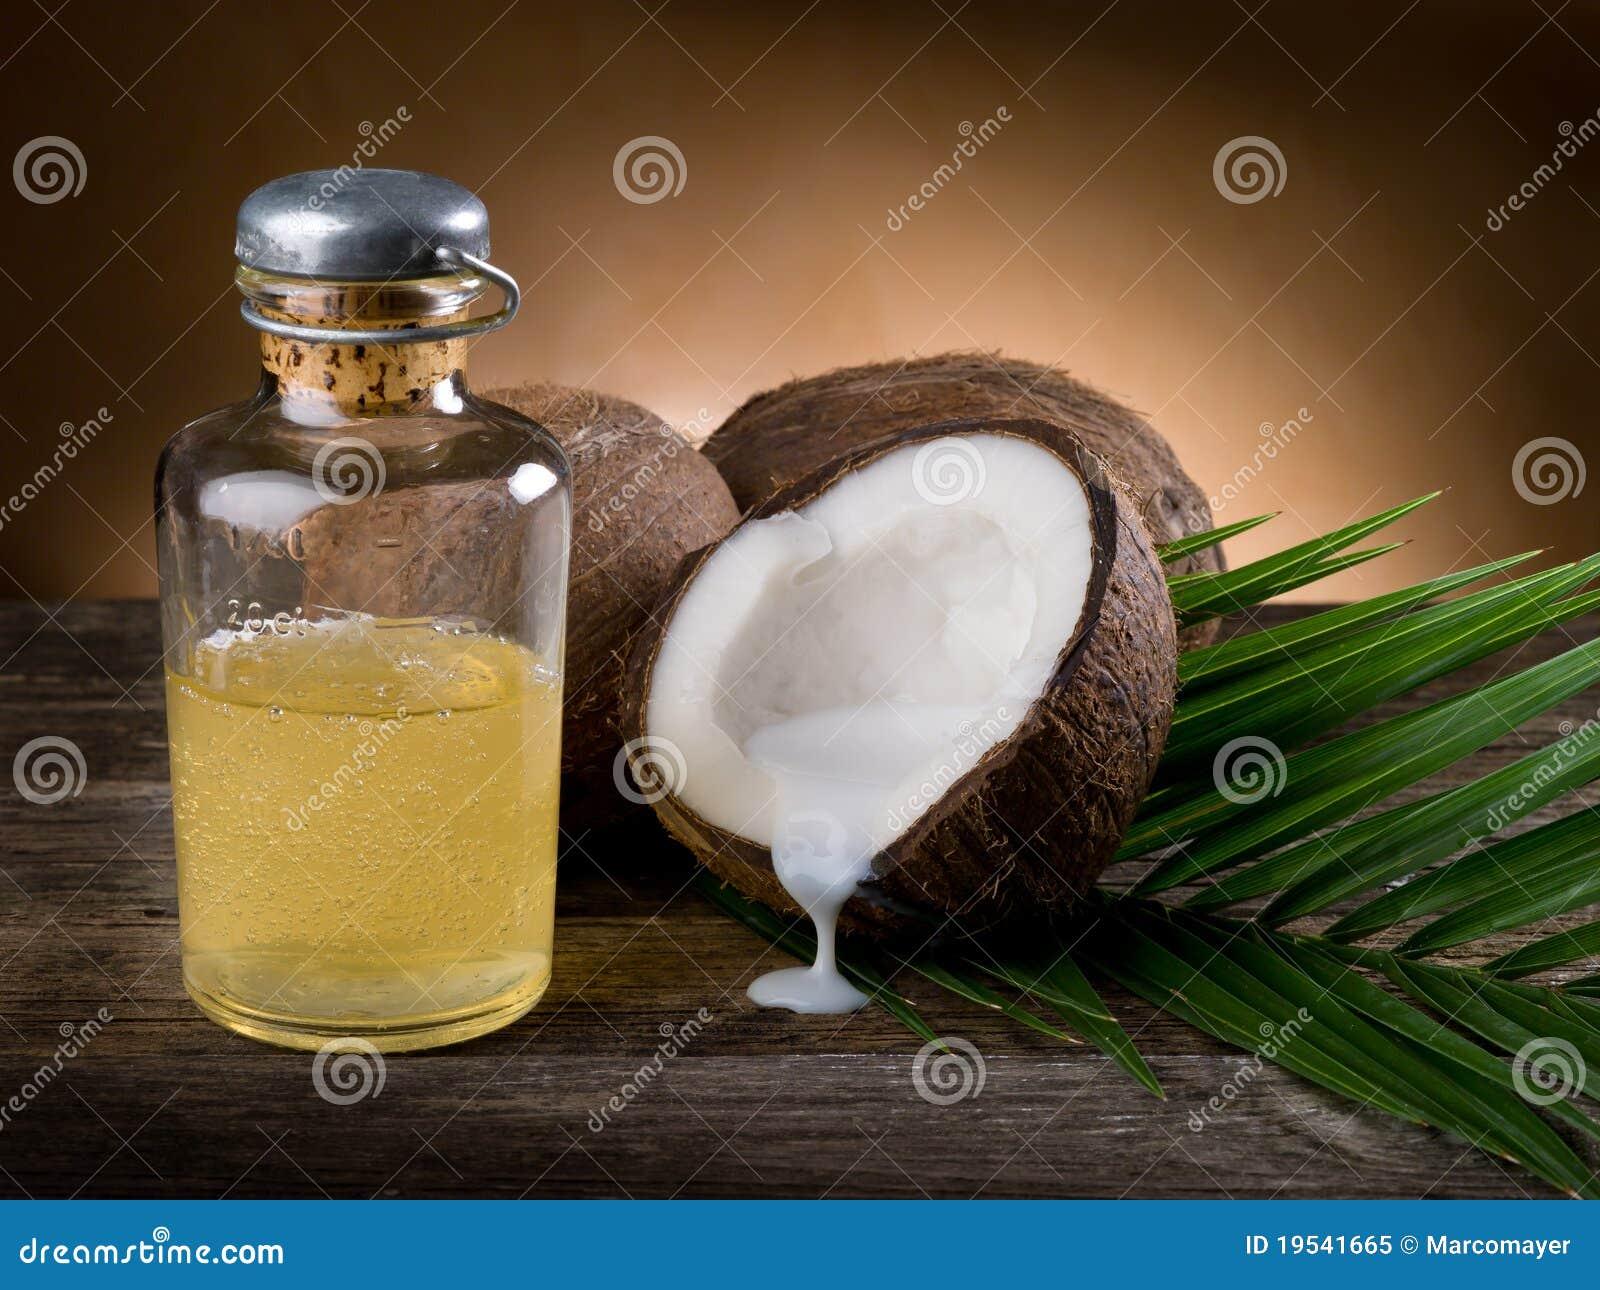 Coconut walnut oil